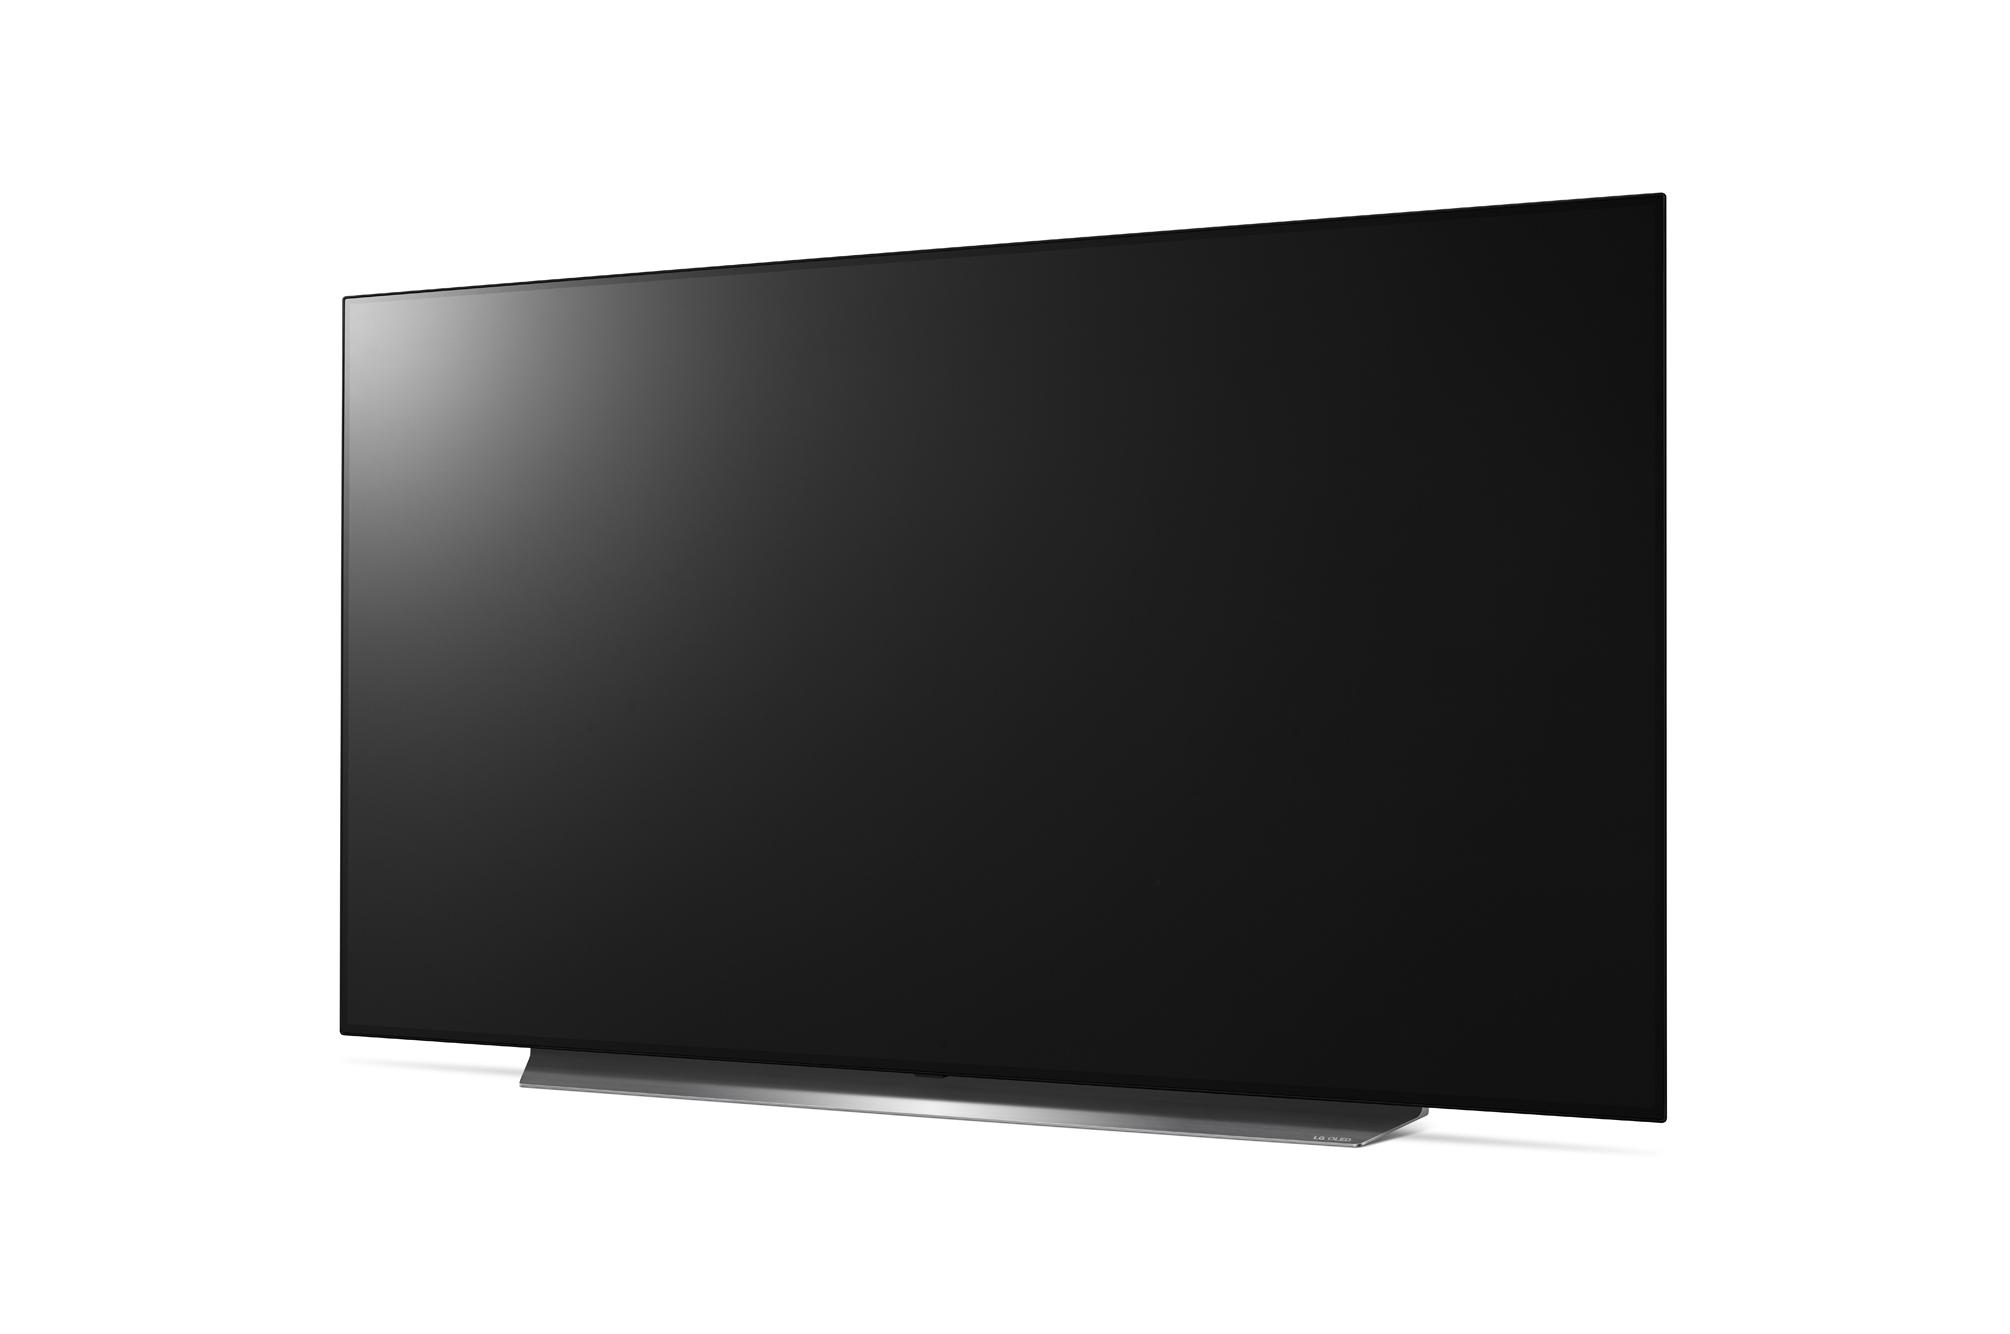 LG Pro:Centric SMART 65ET960H (NA) 3